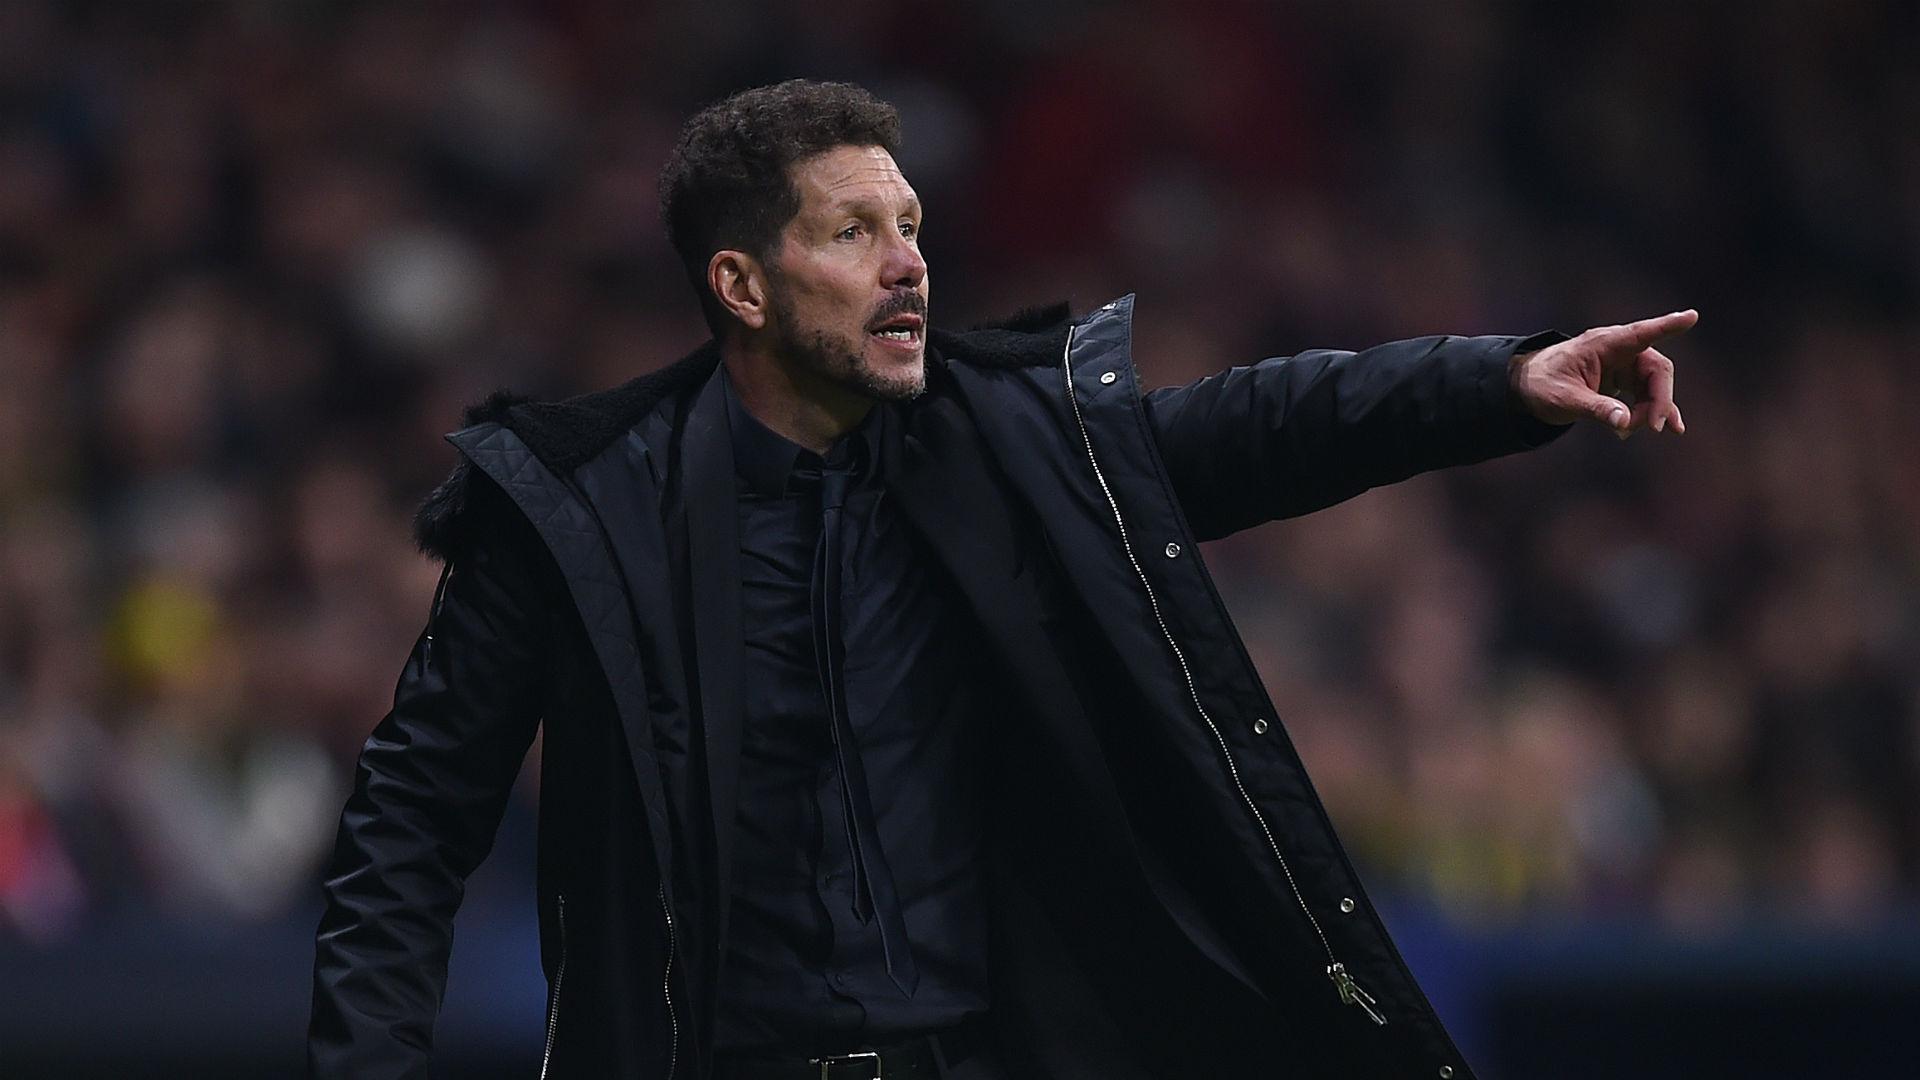 Atletico boss Simeone not fazed by injury rumours